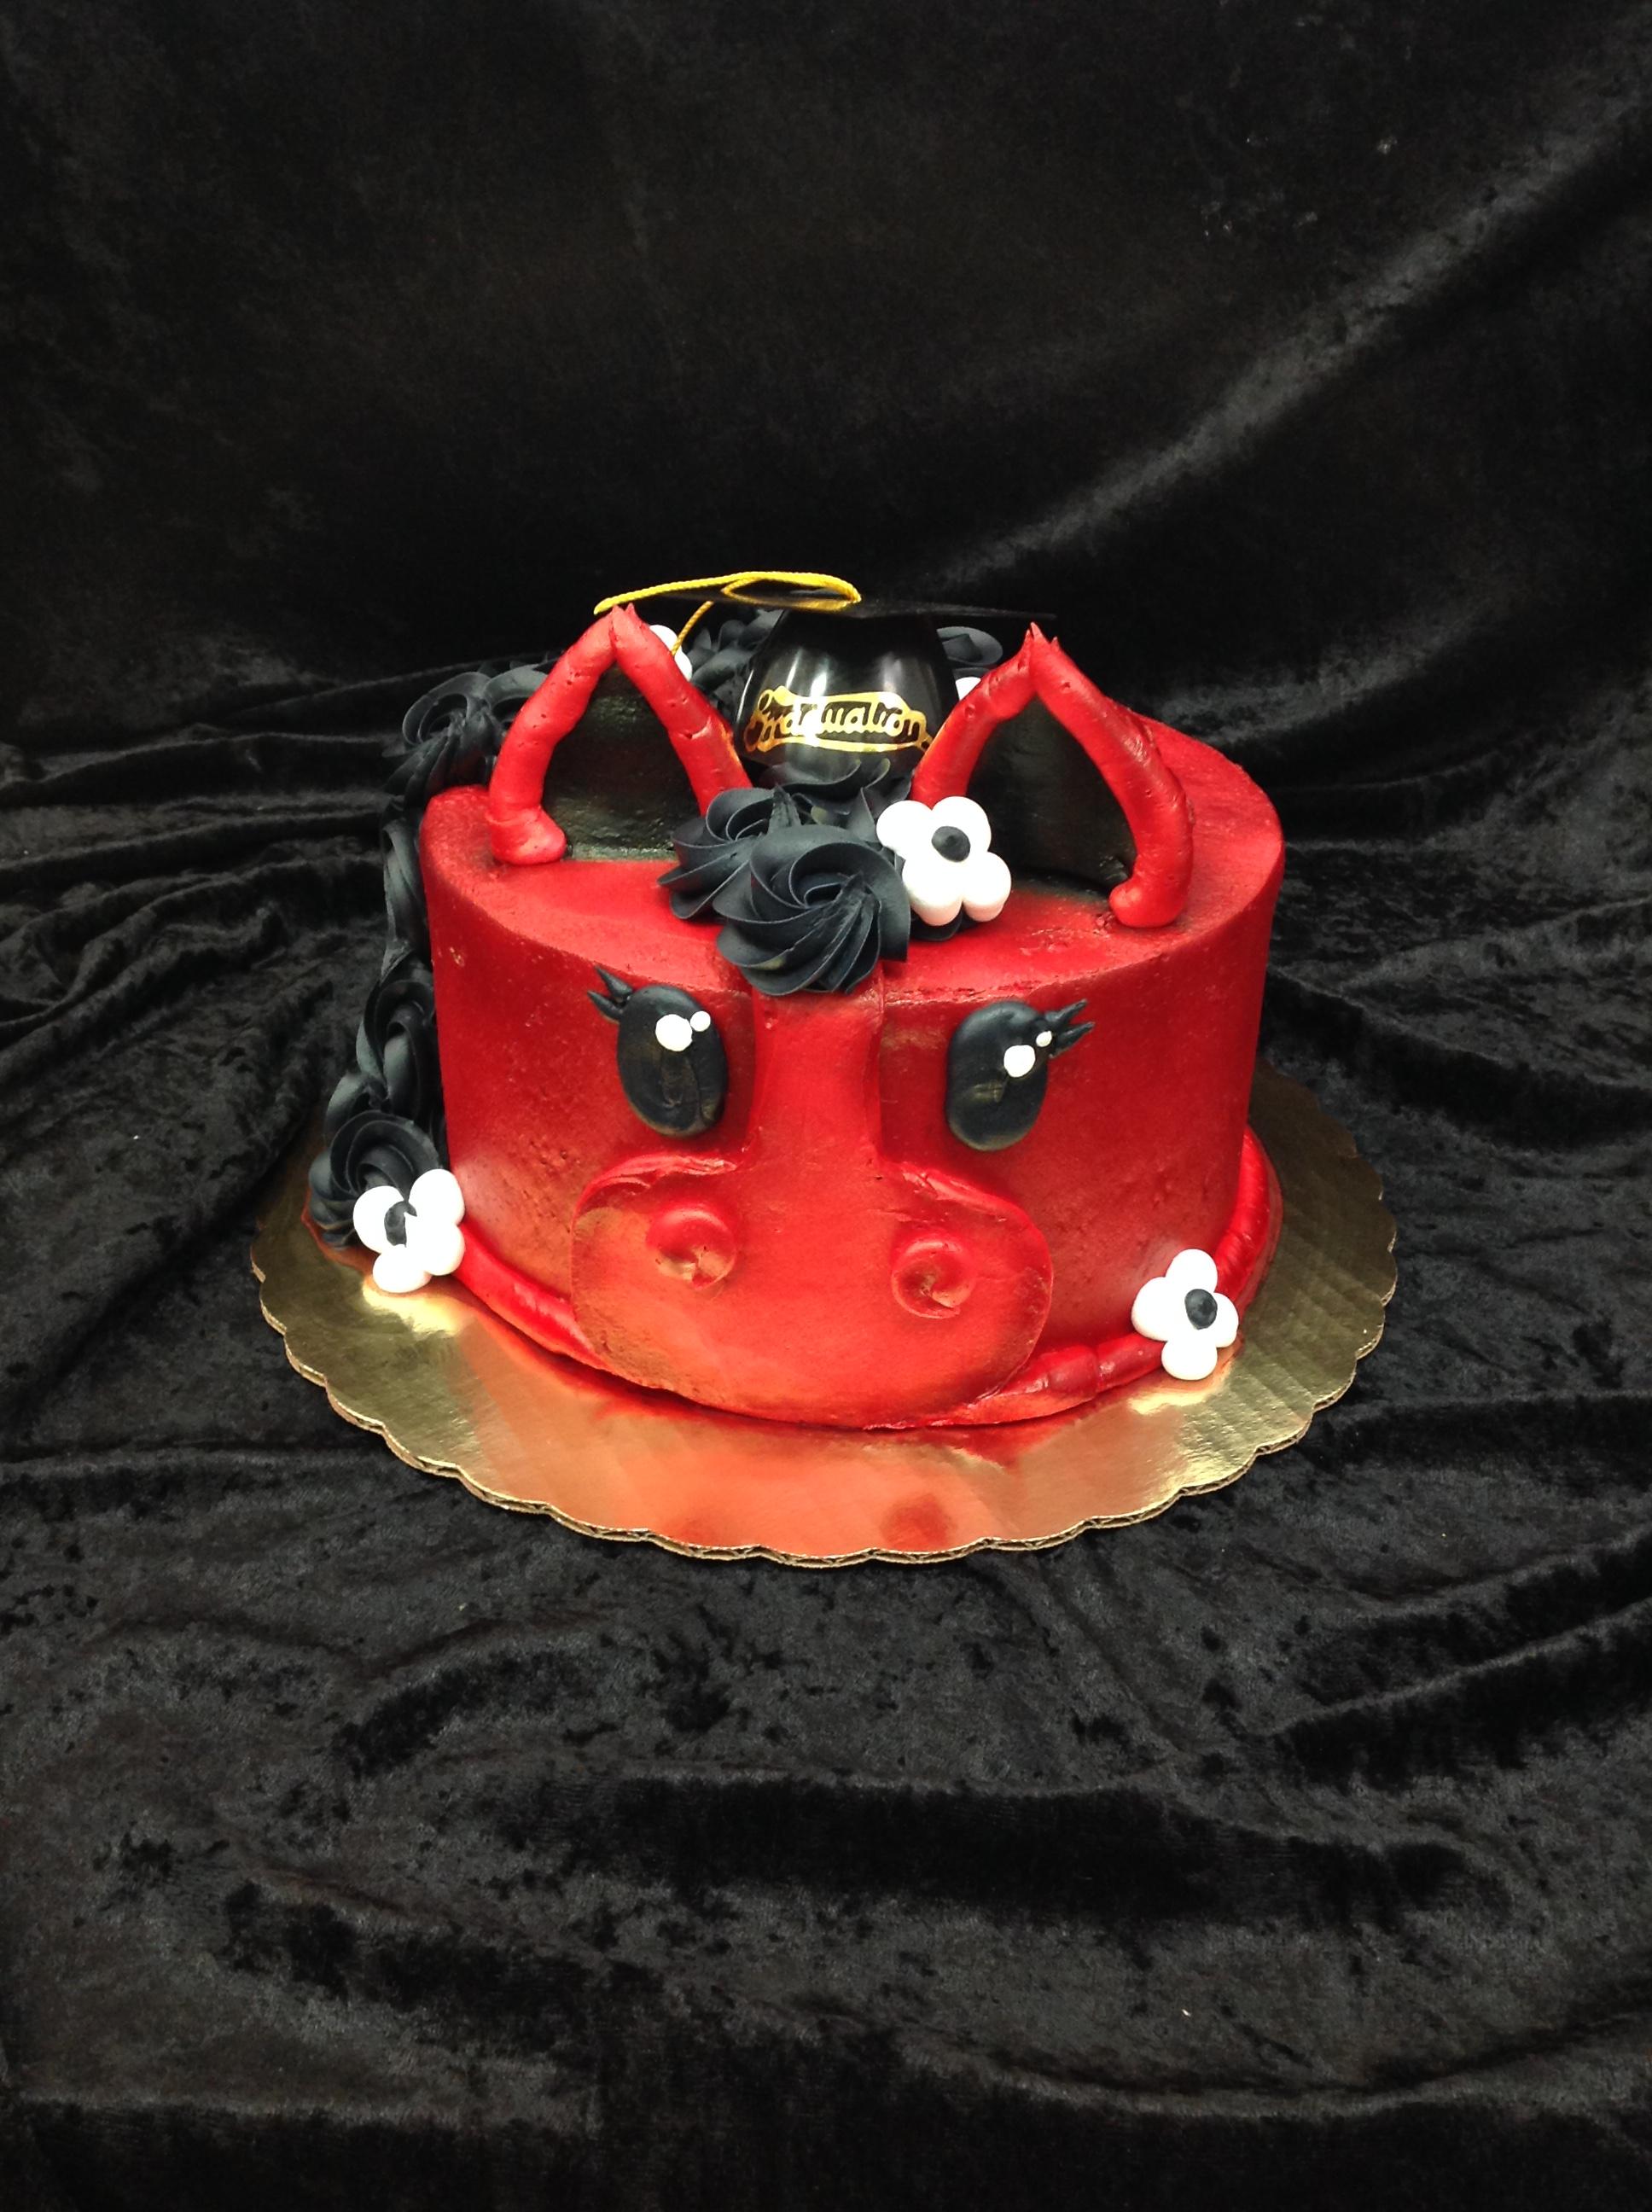 GB-137 Stillwater Pony Grad Cake